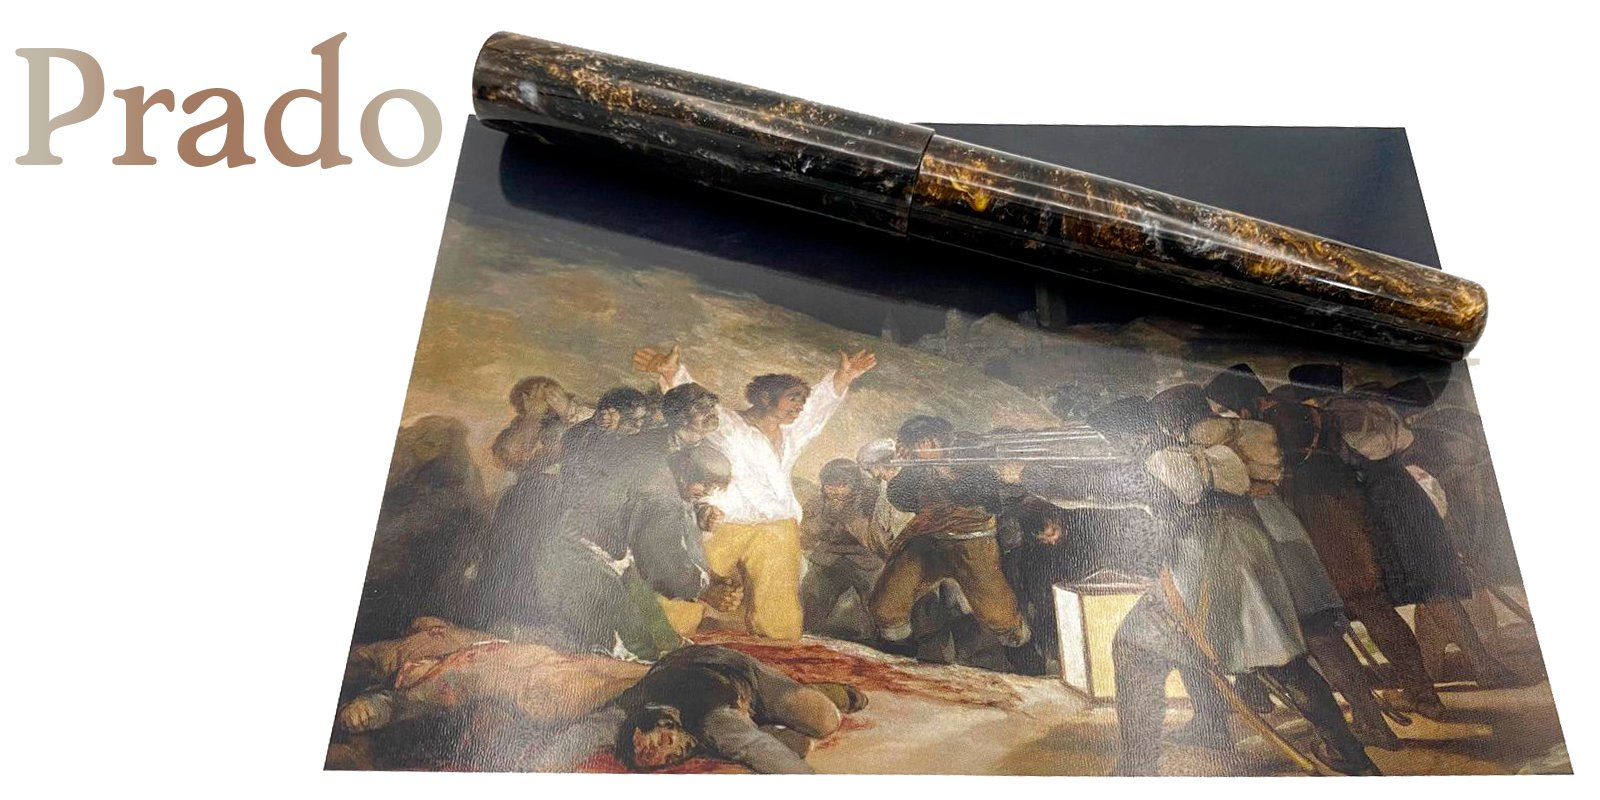 Prado portada 1.jpg